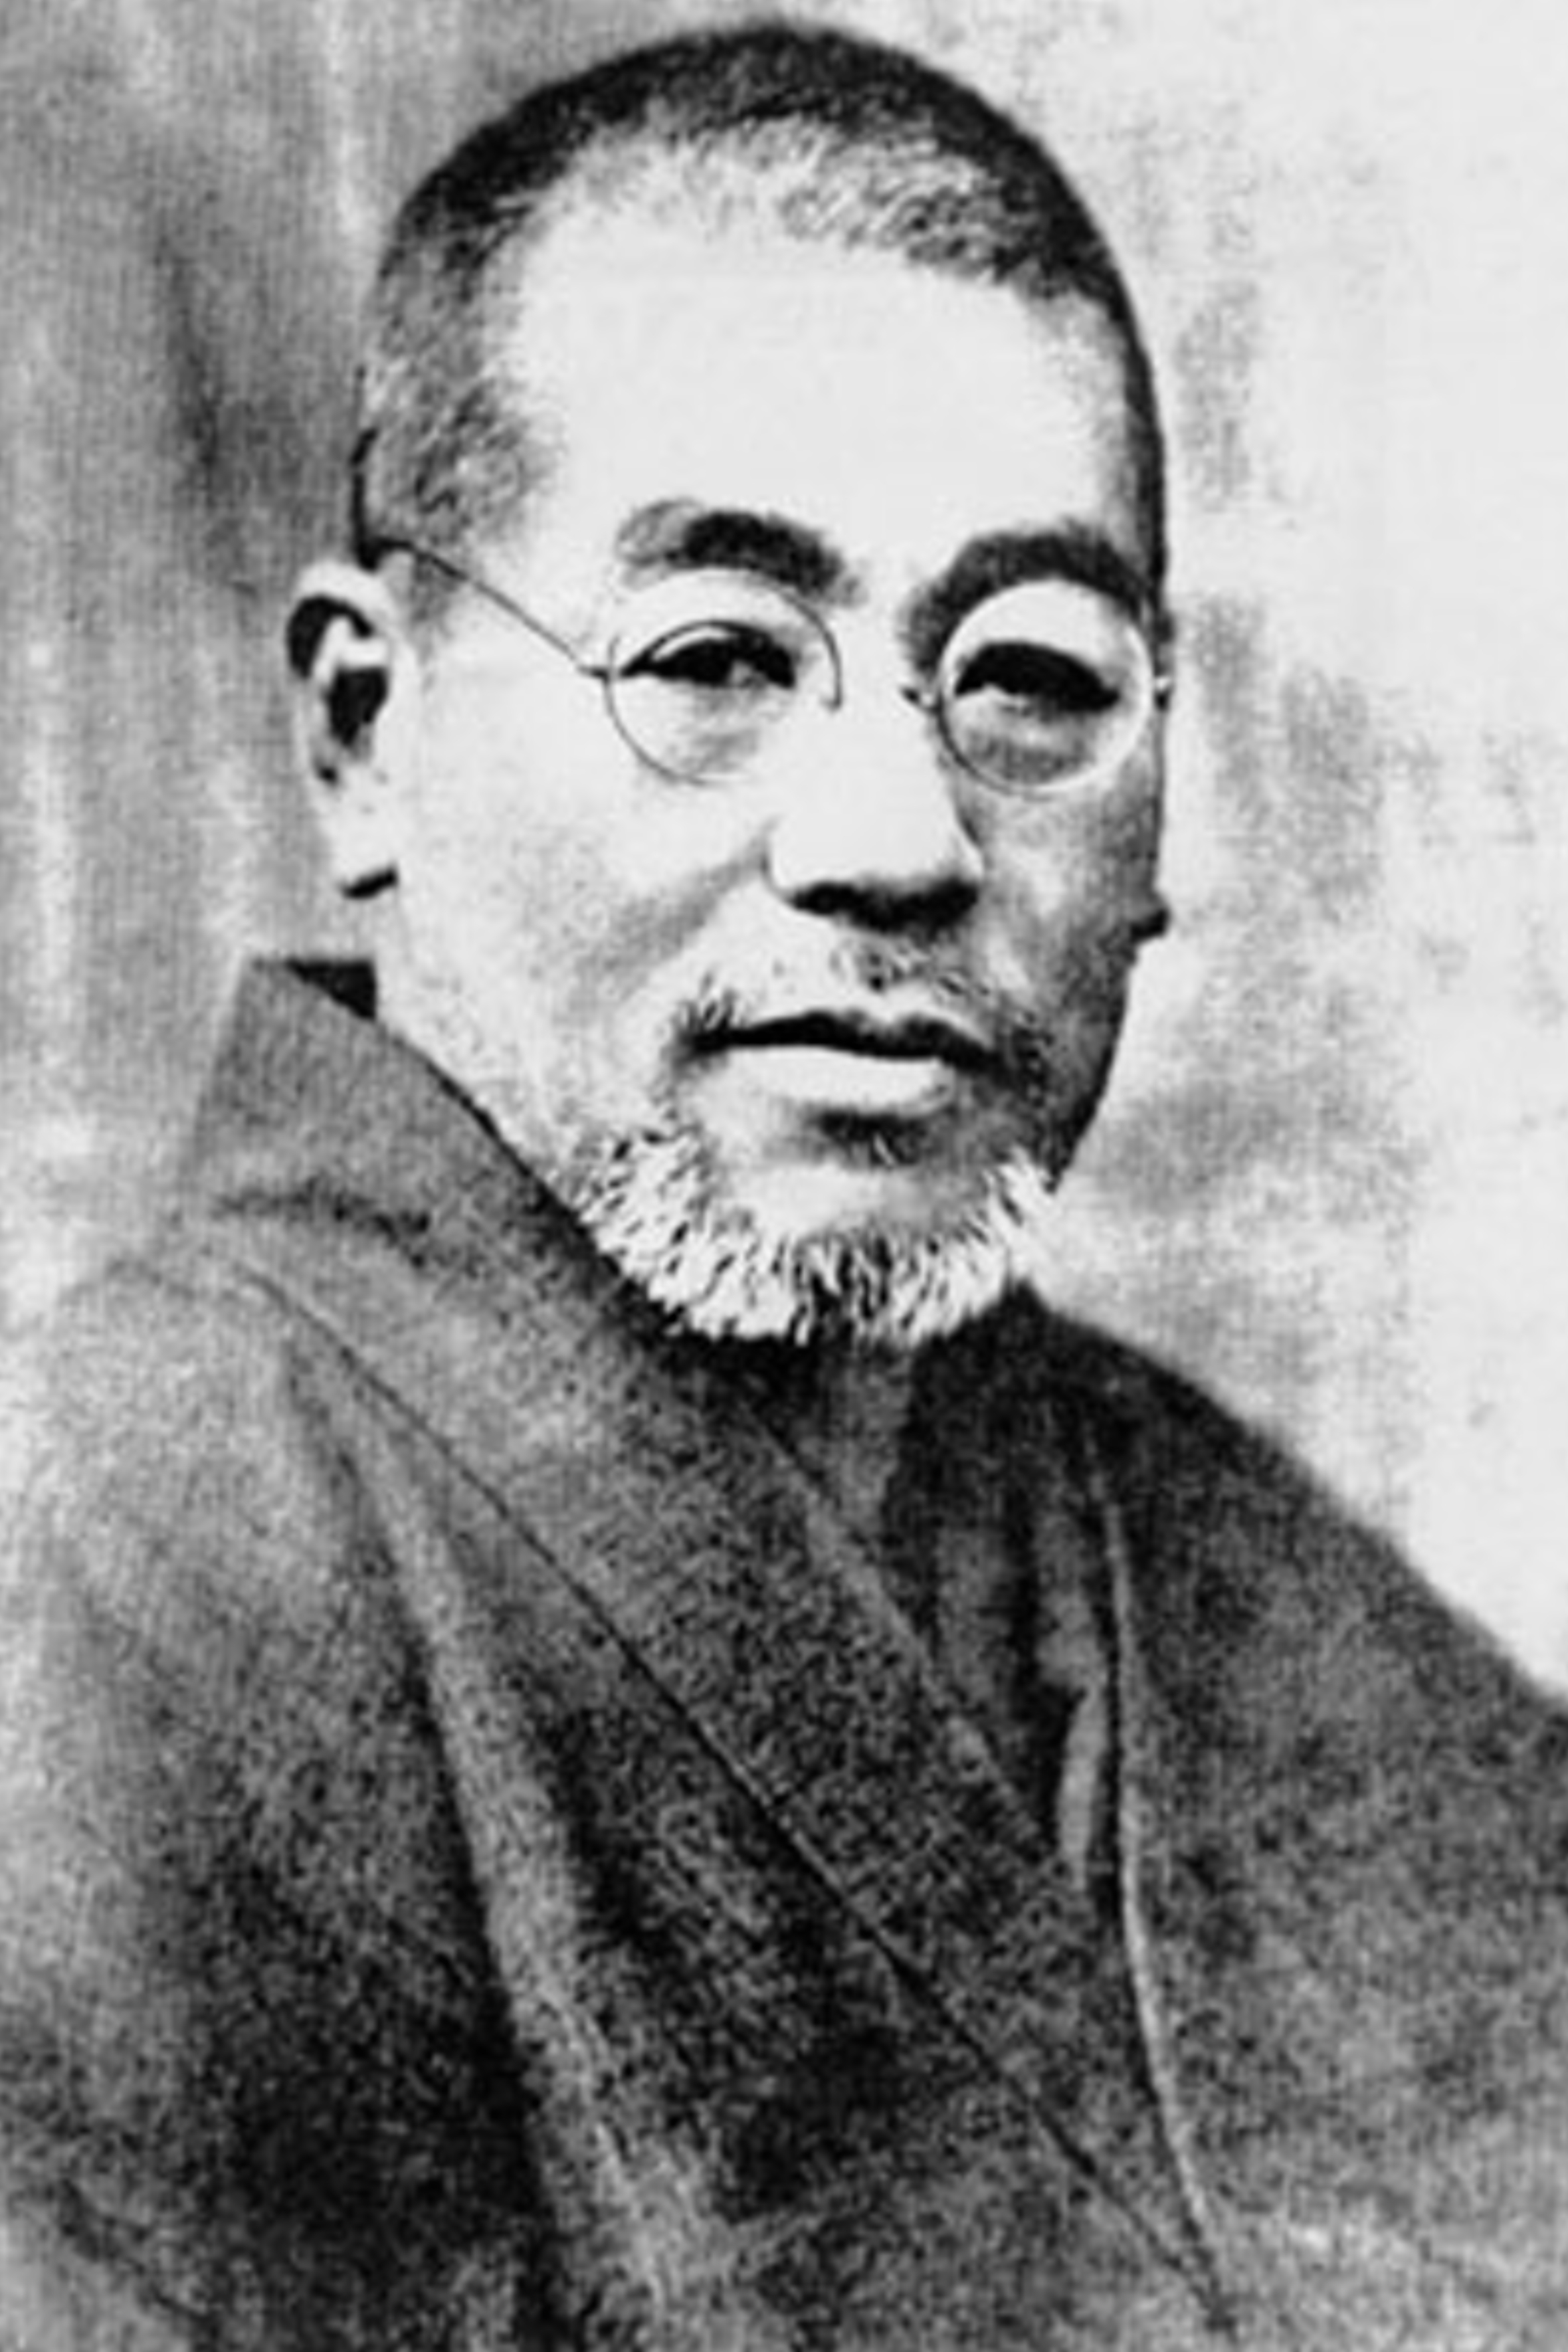 Usui Shiki Ryoho